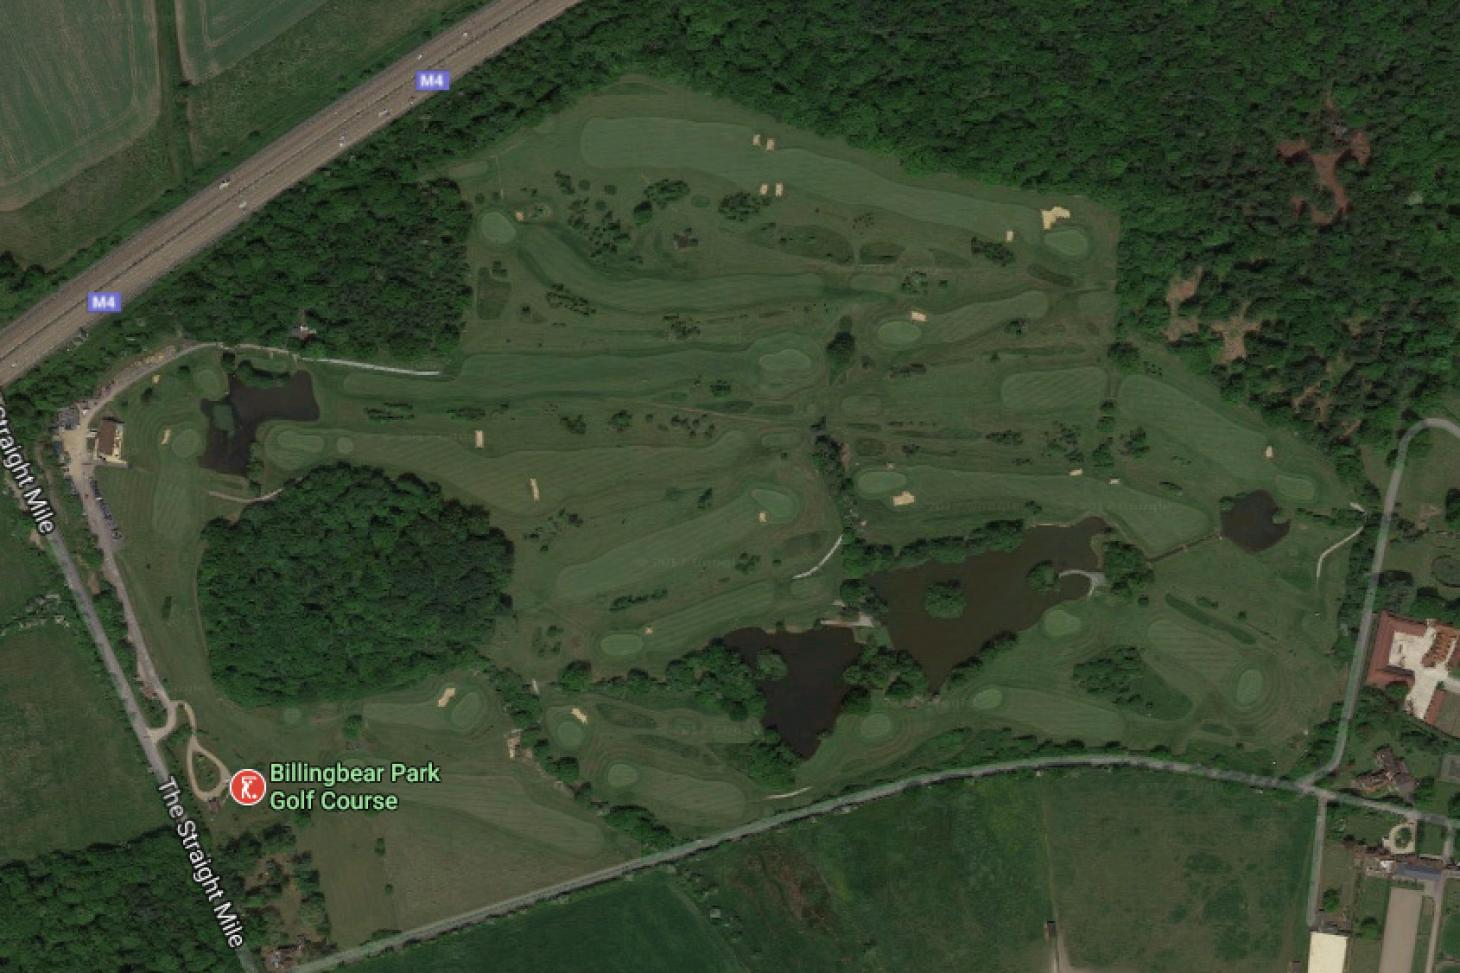 Billingbear Park Golf Course 18 hole golf course